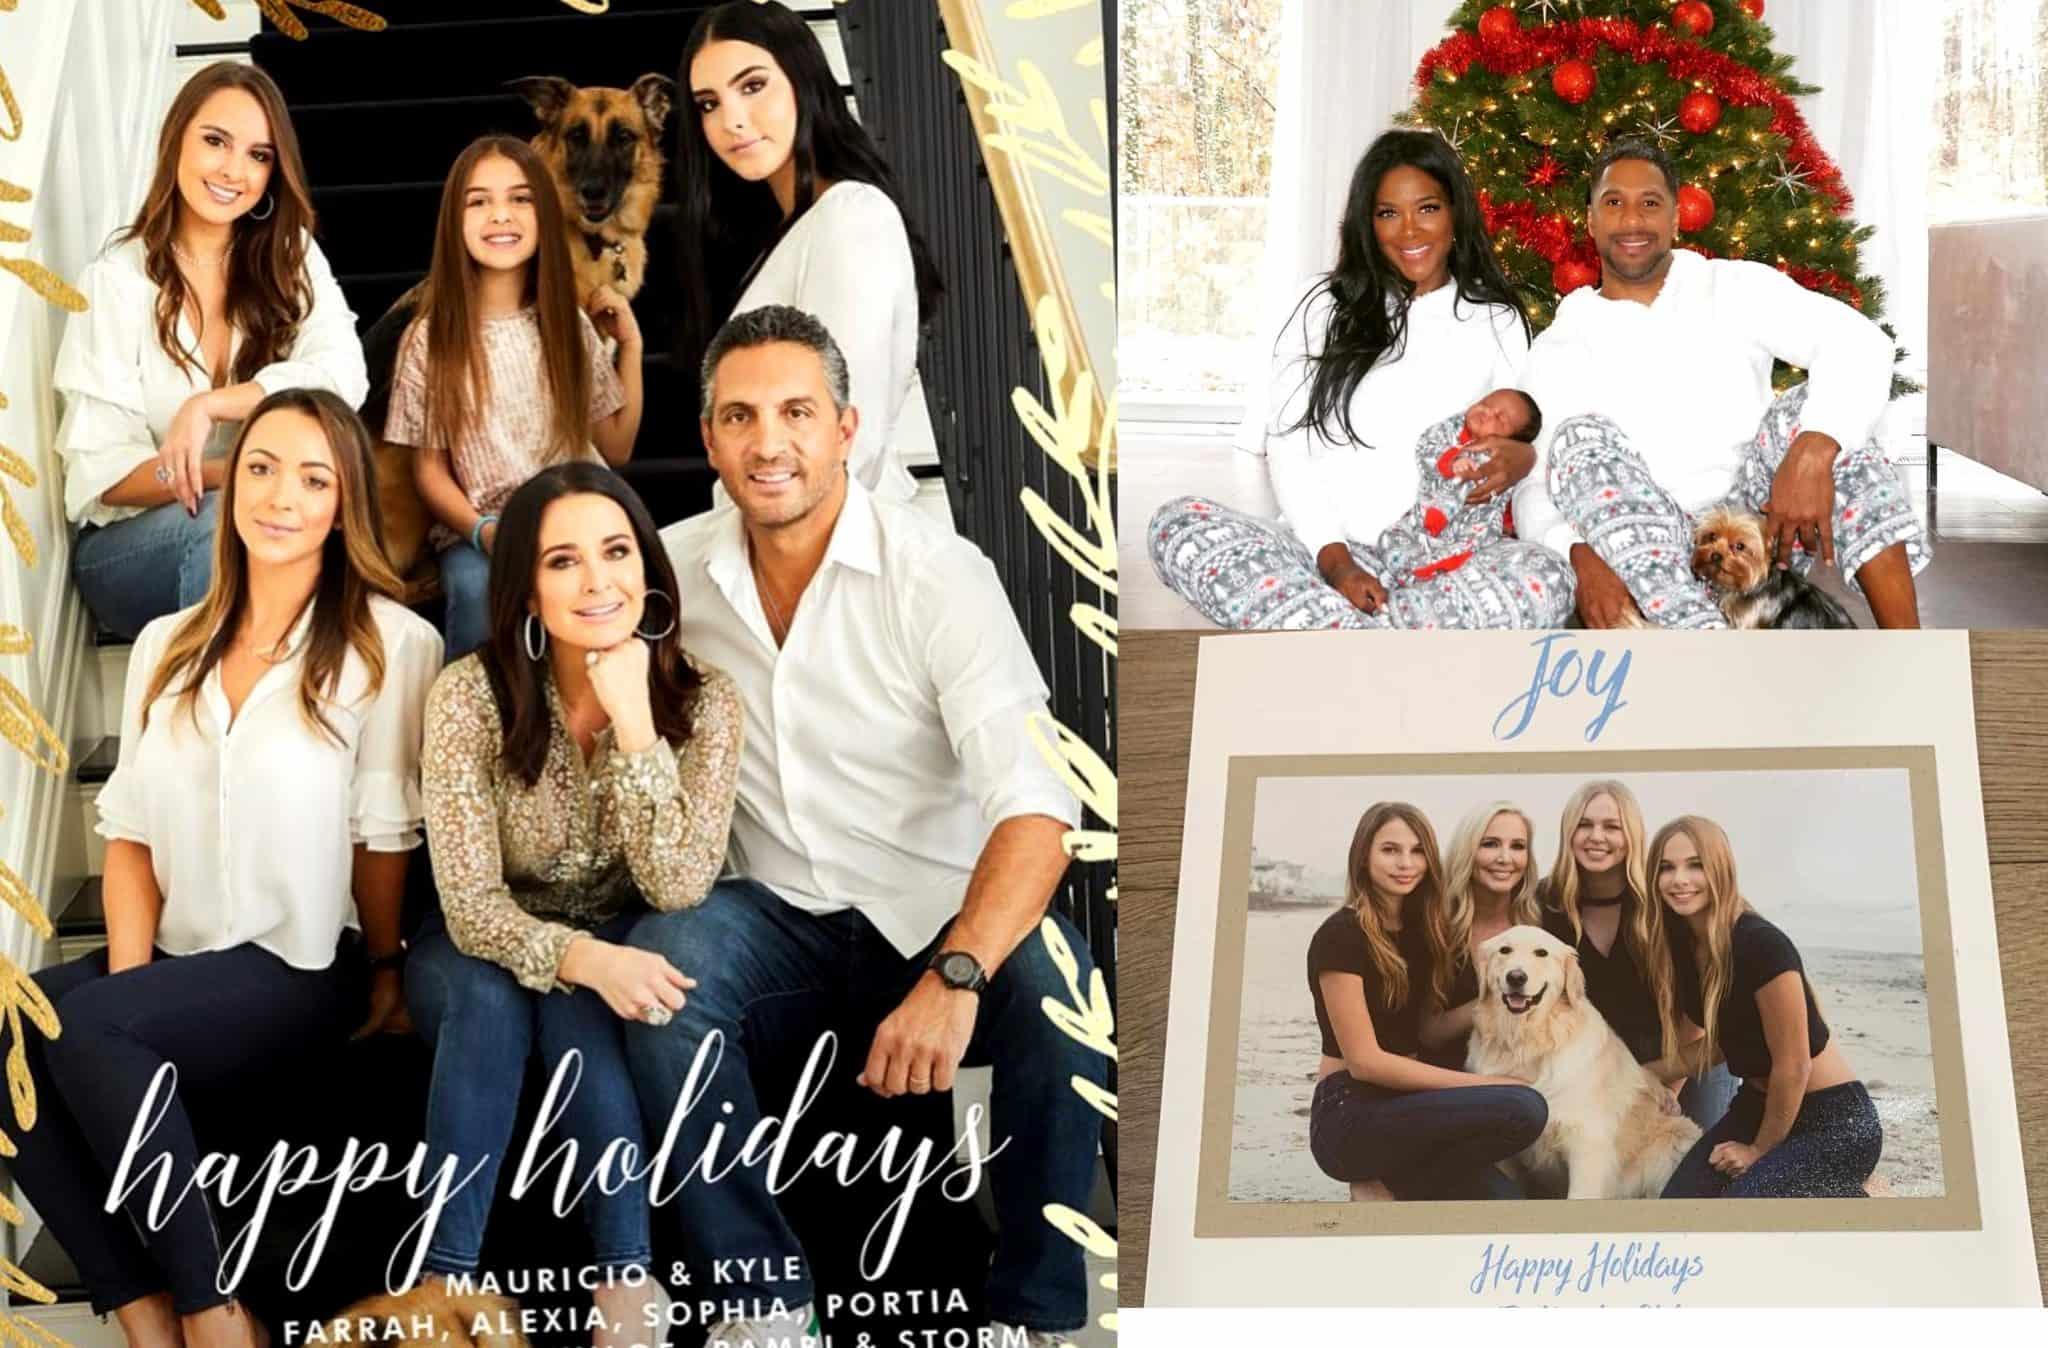 Bravo Stars Christmas Cards Photo - Kyle Richards, Kenya Moore and Shannon Beador